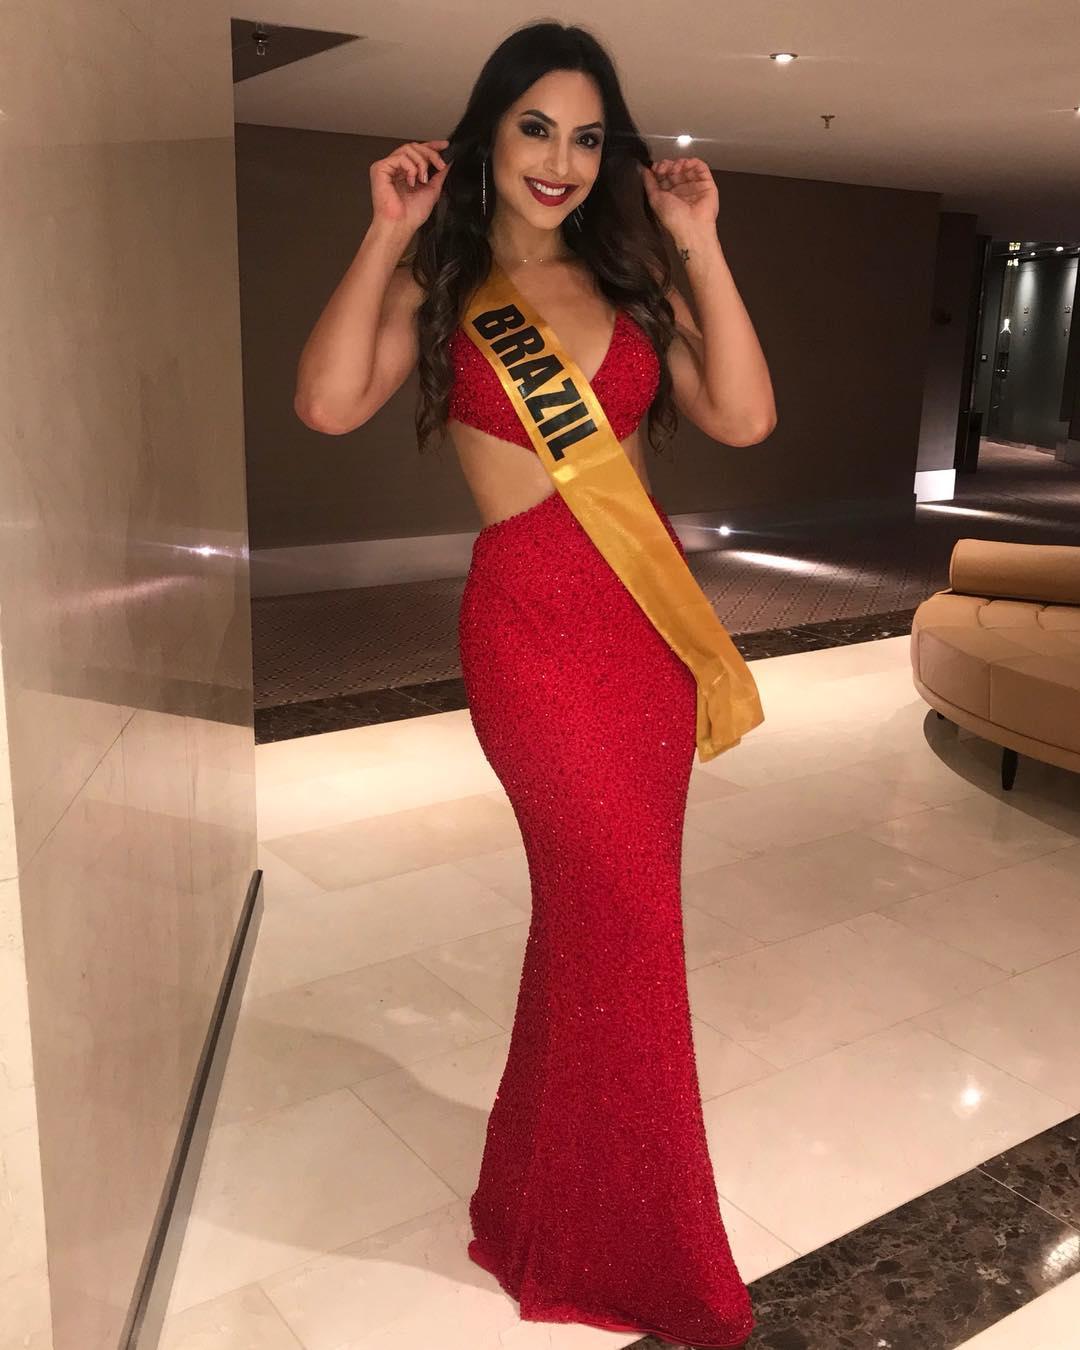 renata puppin, miss polo brasil 2018. - Página 3 39875910